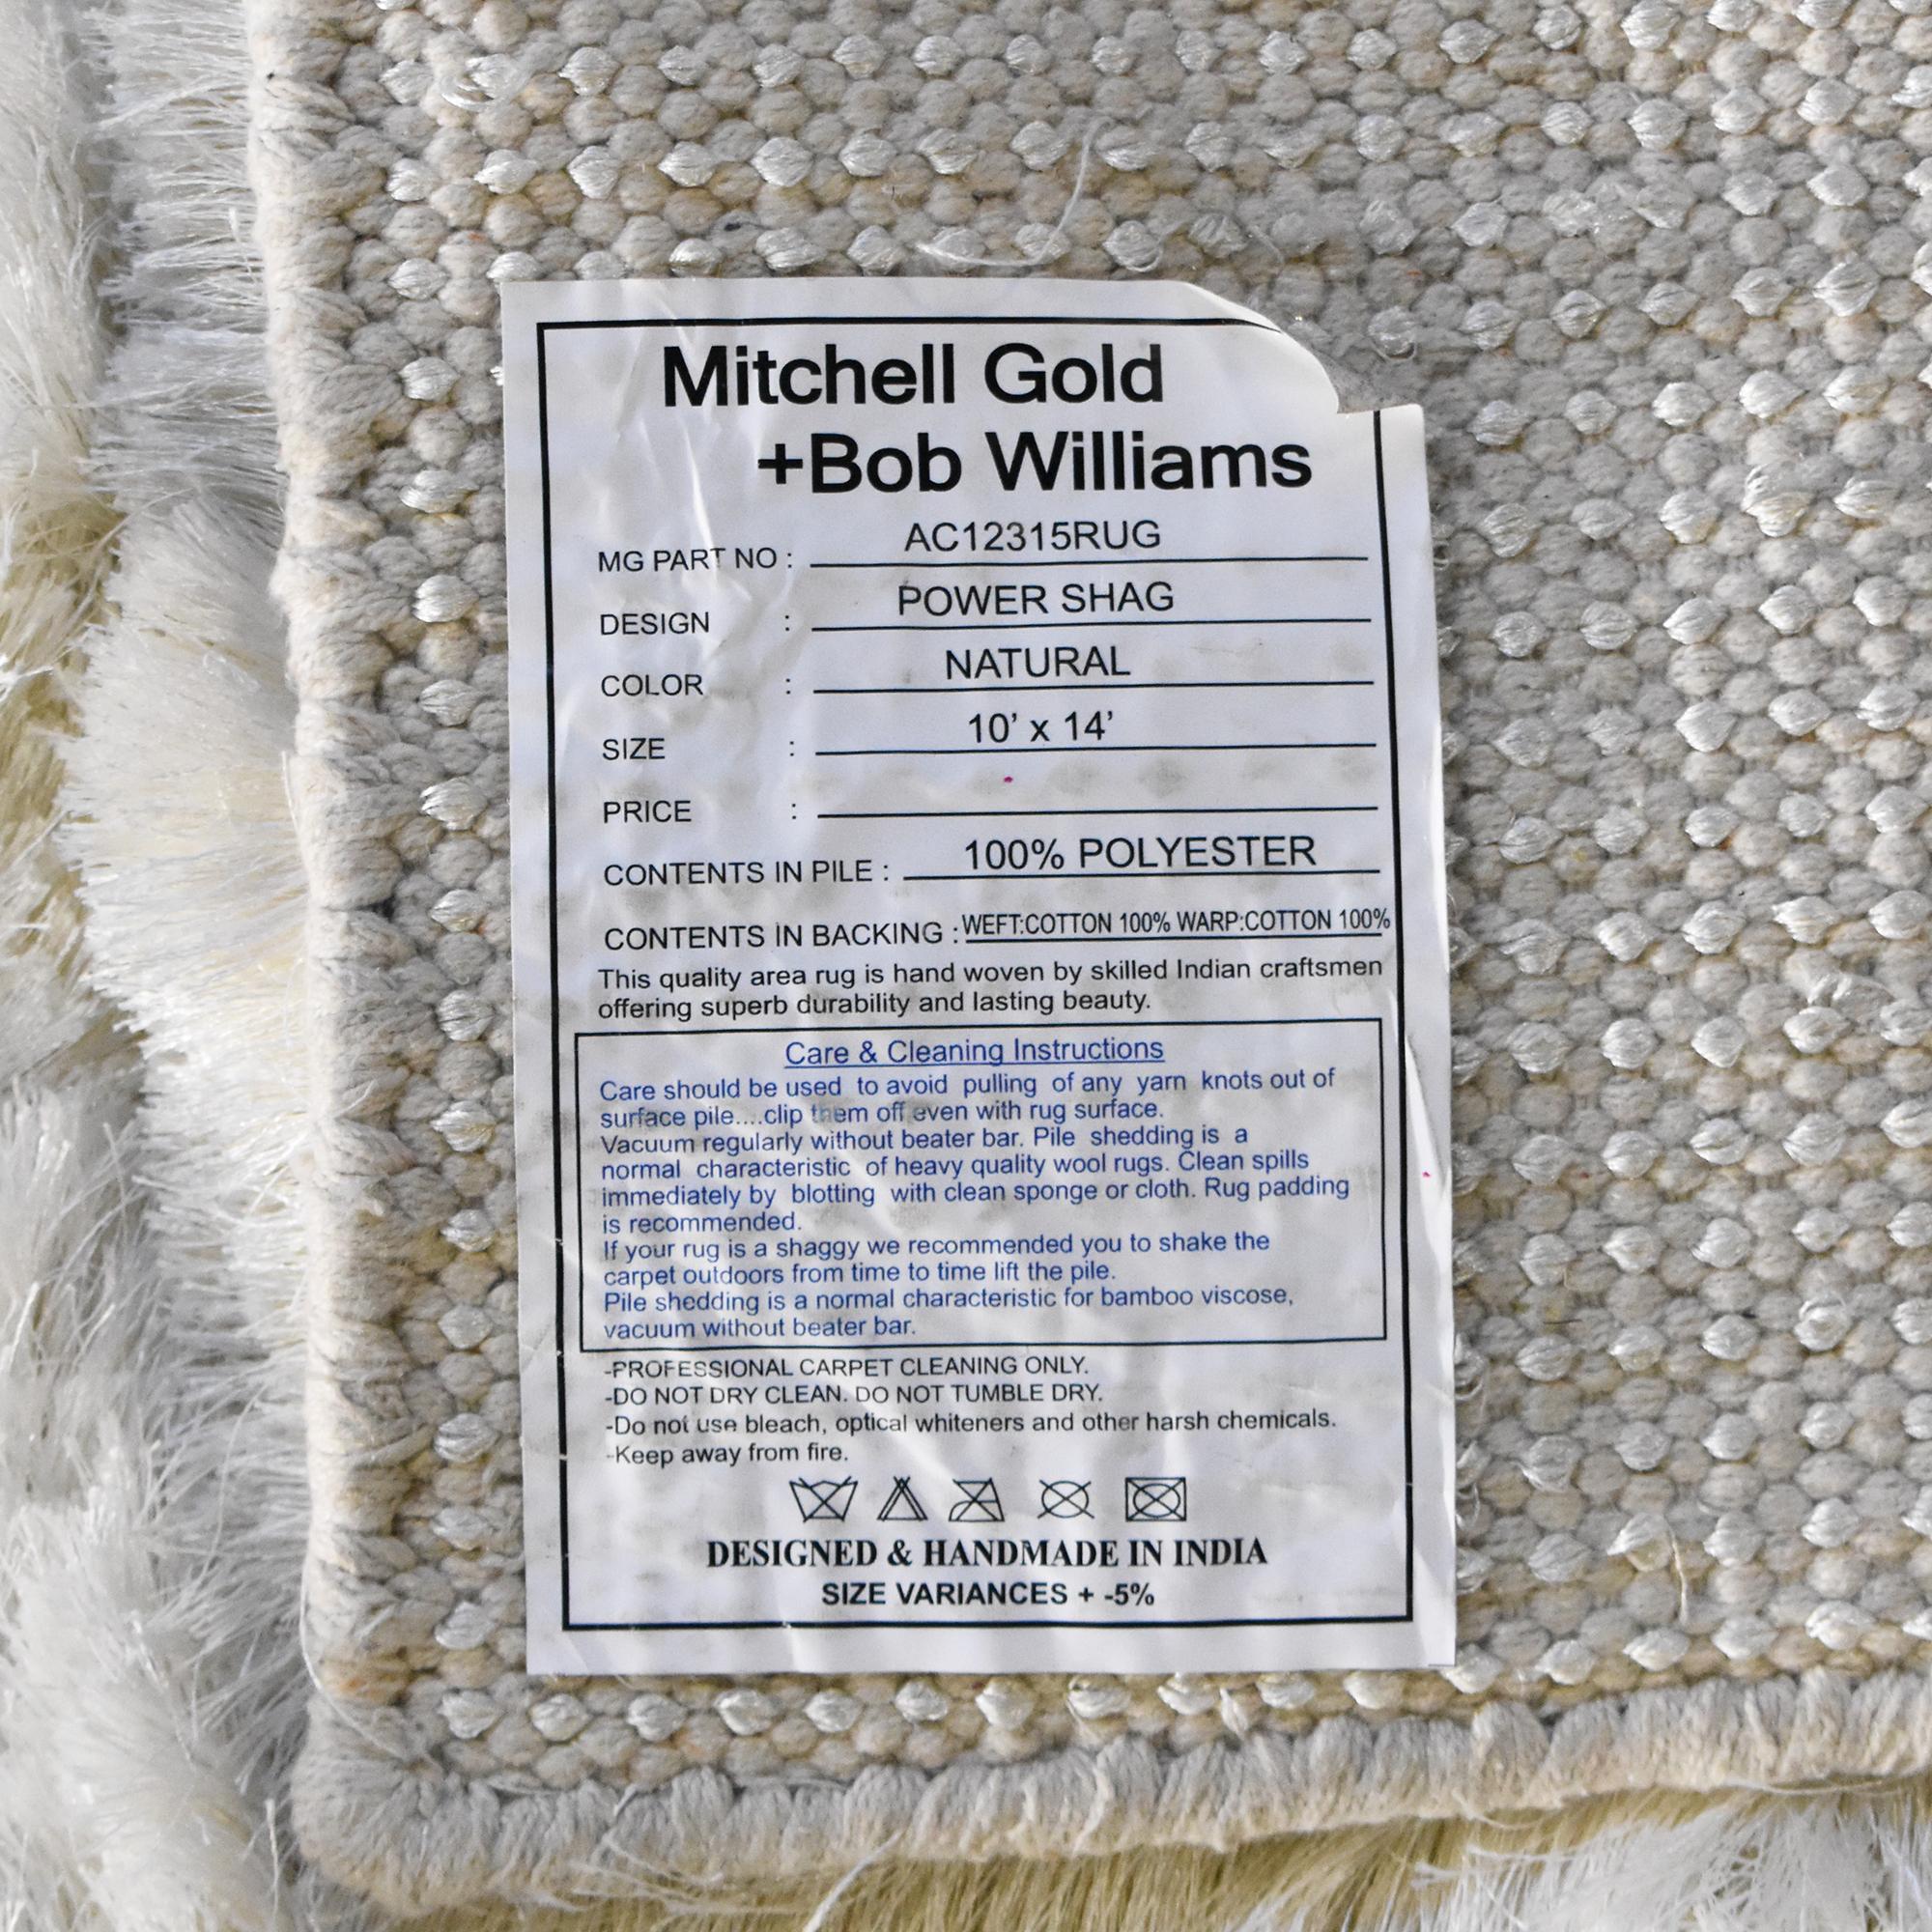 Mitchell Gold + Bob Williams Power Shag Natural Rug Mitchell Gold + Bob Williams